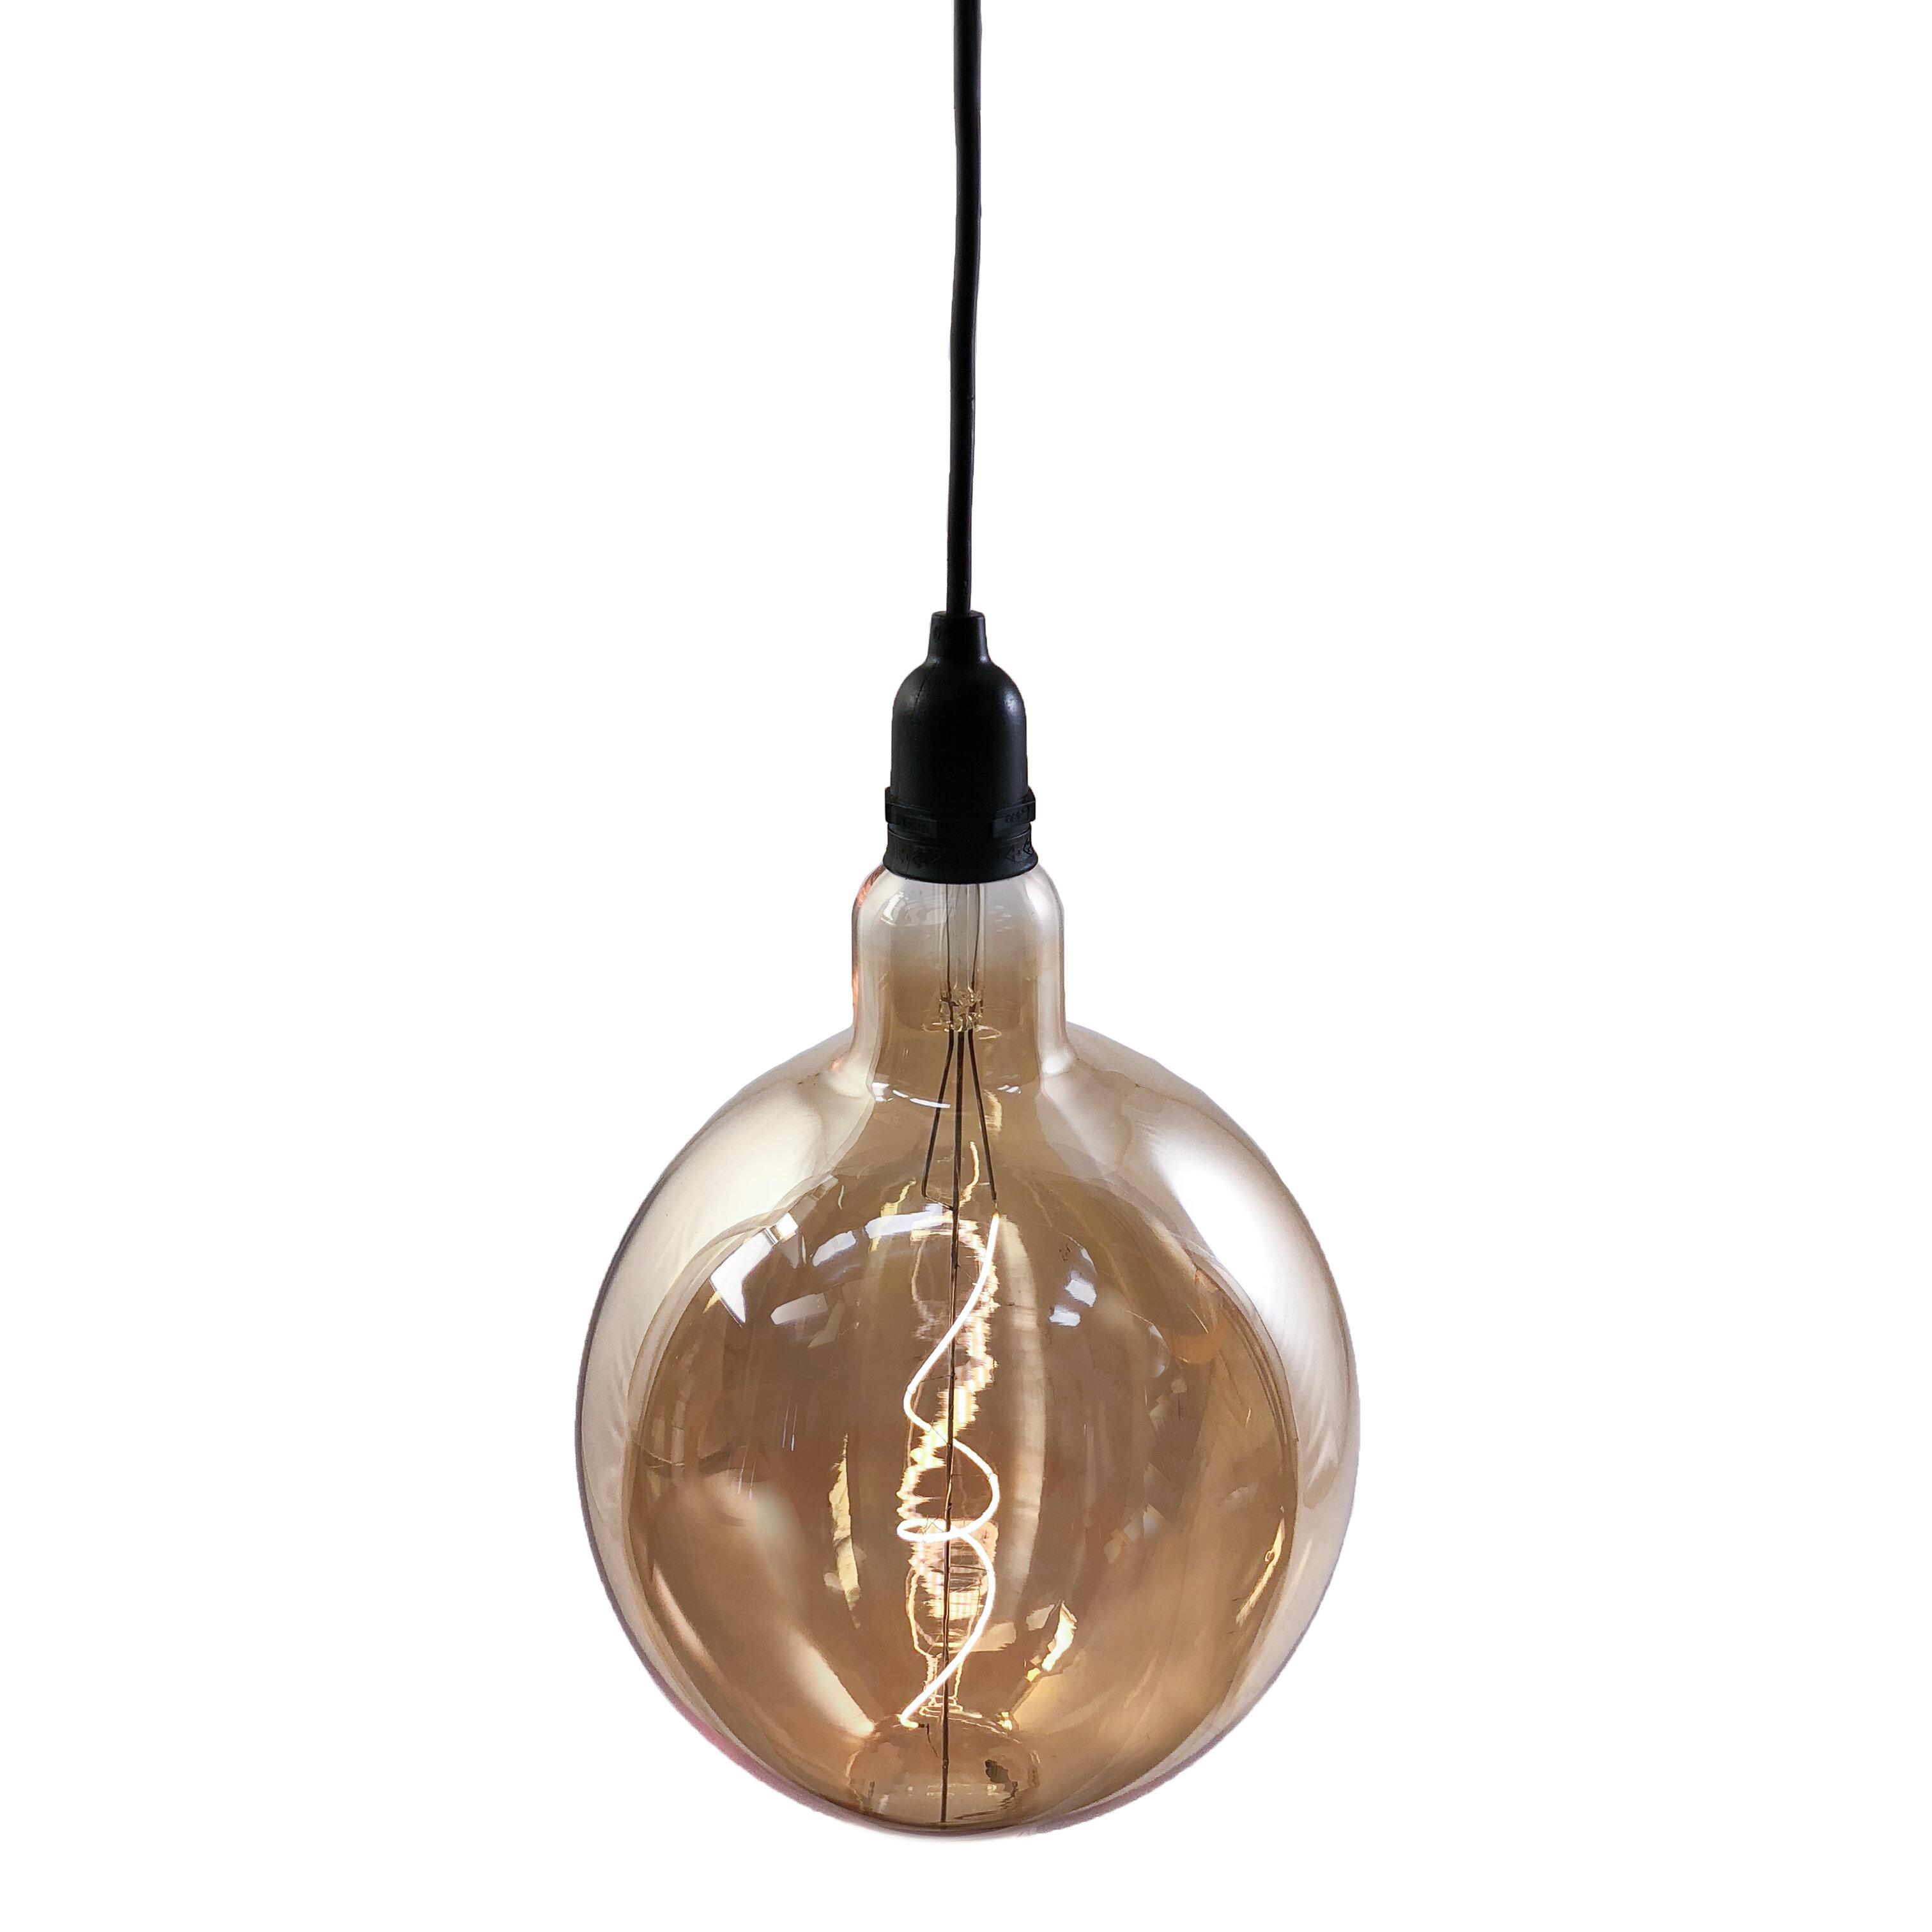 Williston Forge Beideman Battery Operated Globe 1 Light Led Outdoor Pendant Reviews Wayfair